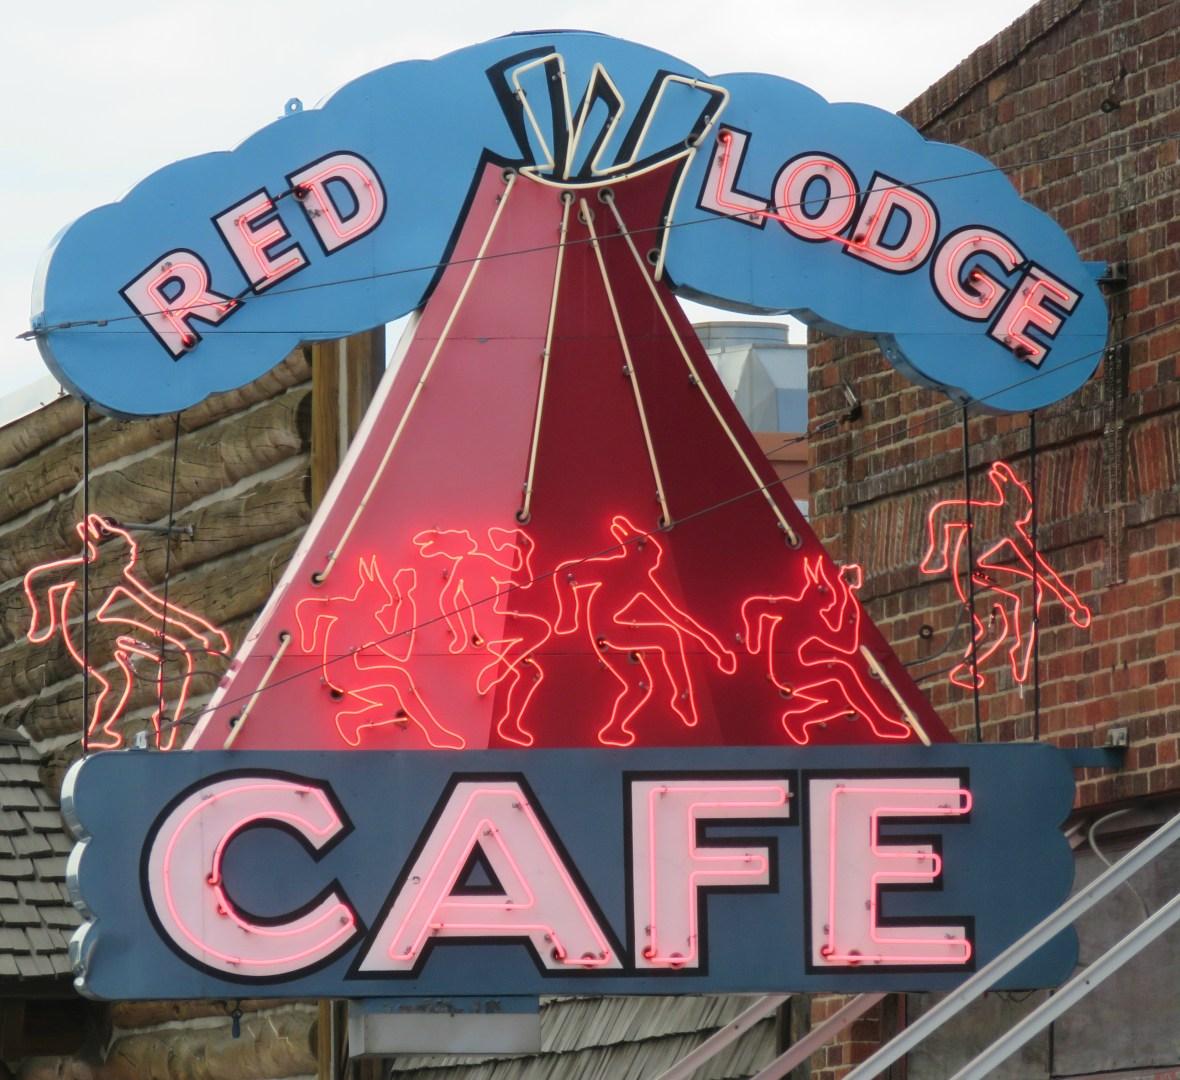 Red Lodge Cafe - 16 Broadway Avenue, Red Lodge, Montana U.S.A. - June 15, 2016